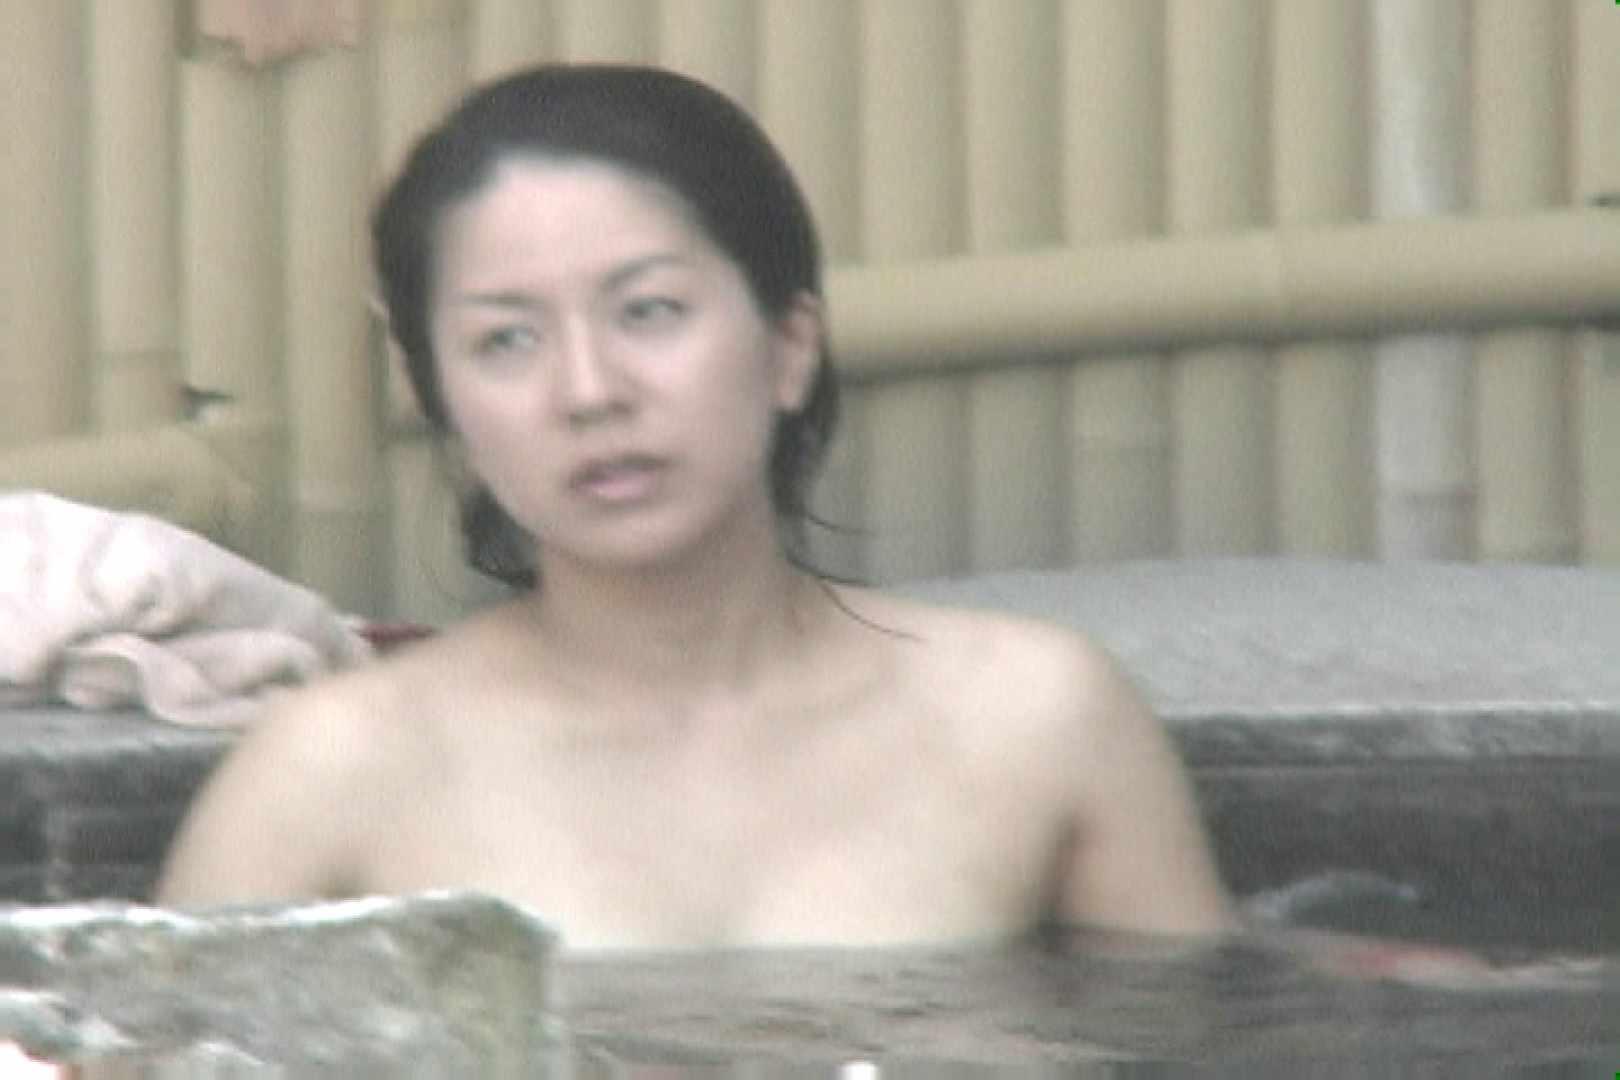 Aquaな露天風呂Vol.694 露天 オメコ無修正動画無料 110PICs 95